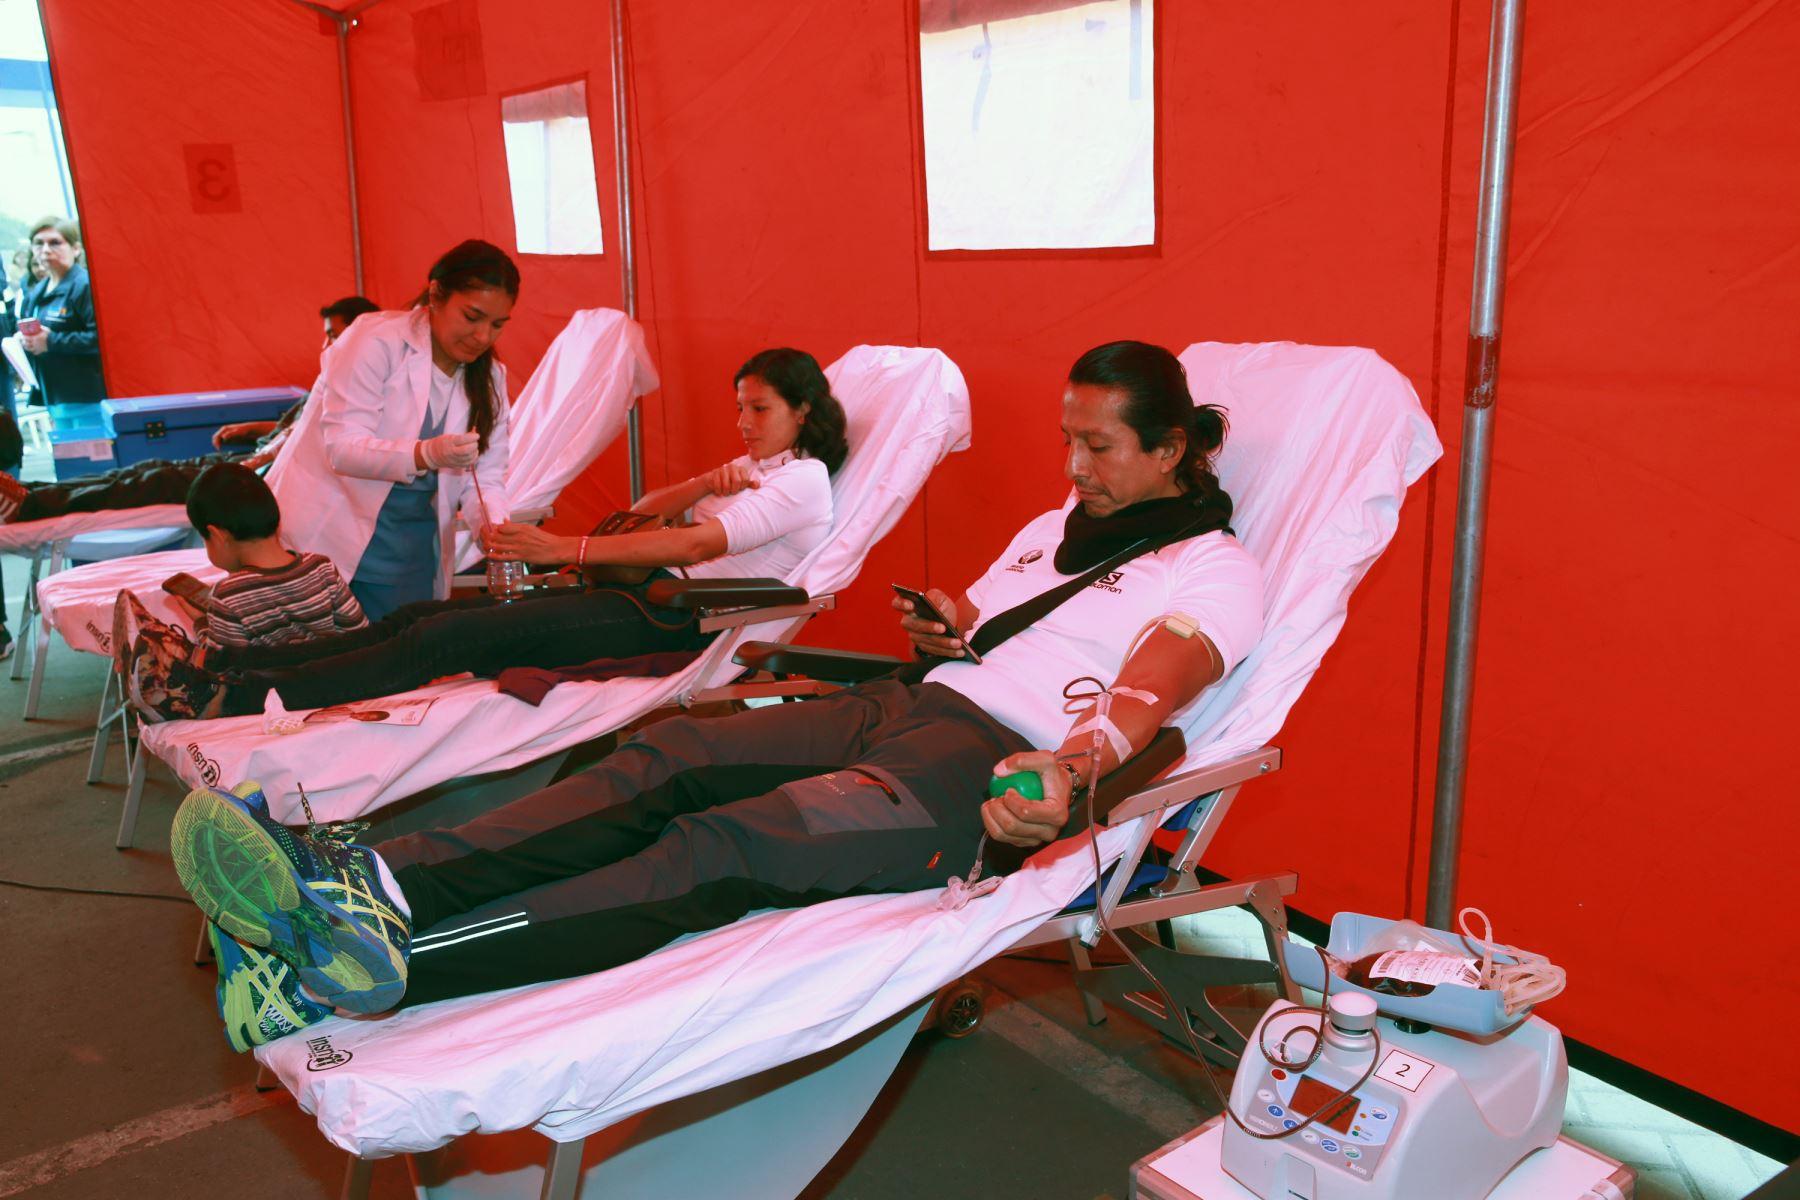 Buscan crear cultura de donación de sangre. Foto: ANDINA/Norman Córdova